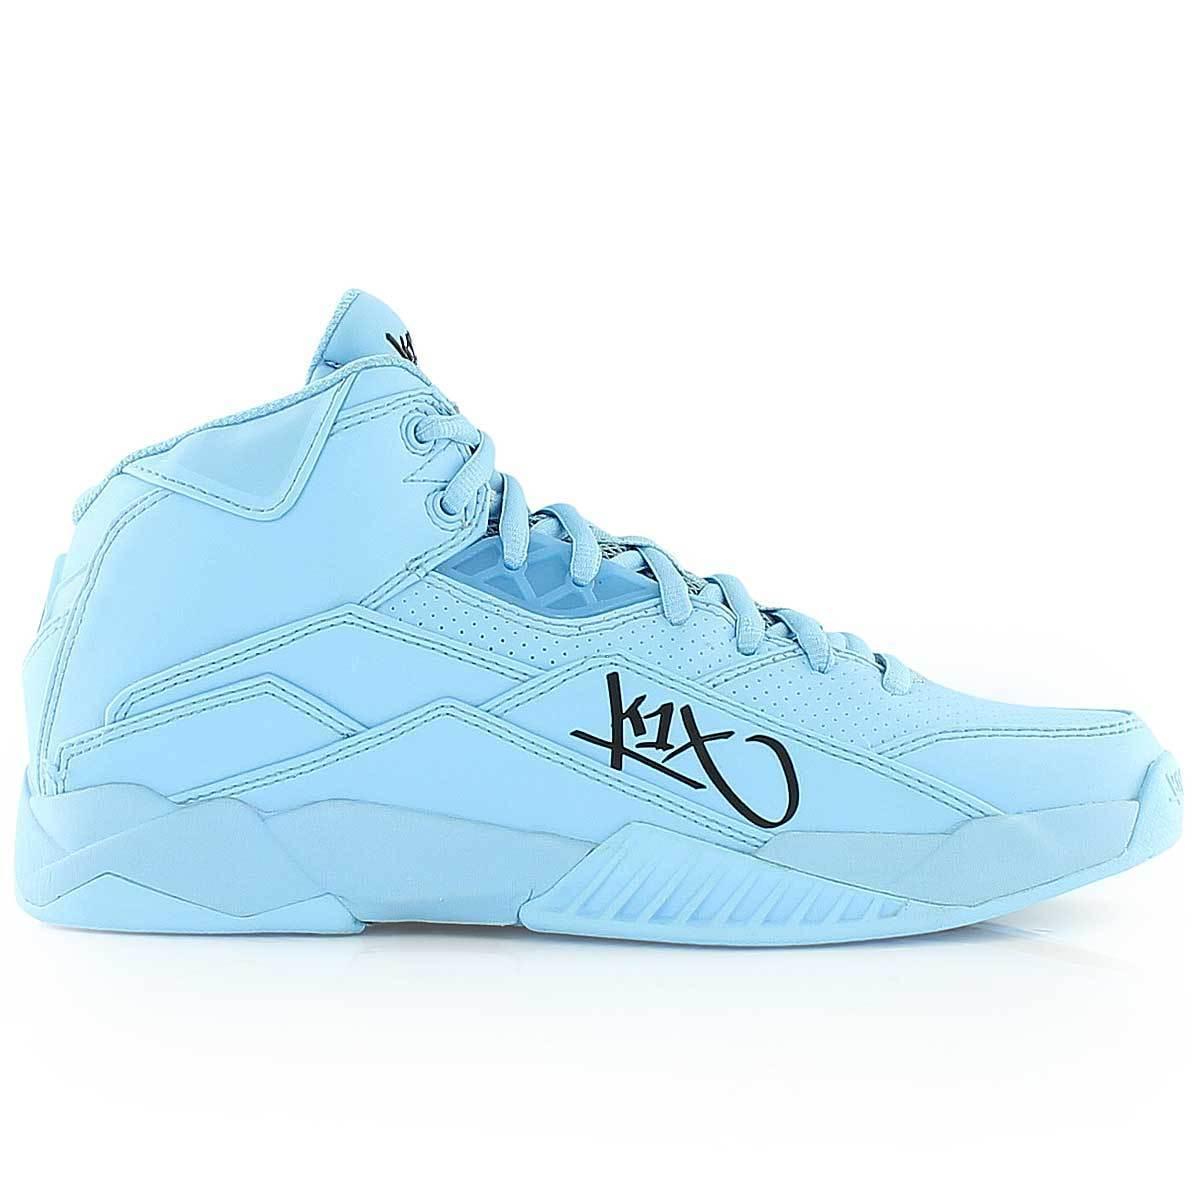 K1X  Anti Gravity Cocheolina Baloncesto Zapatos Azul Claro Medio Corte  venta con alto descuento